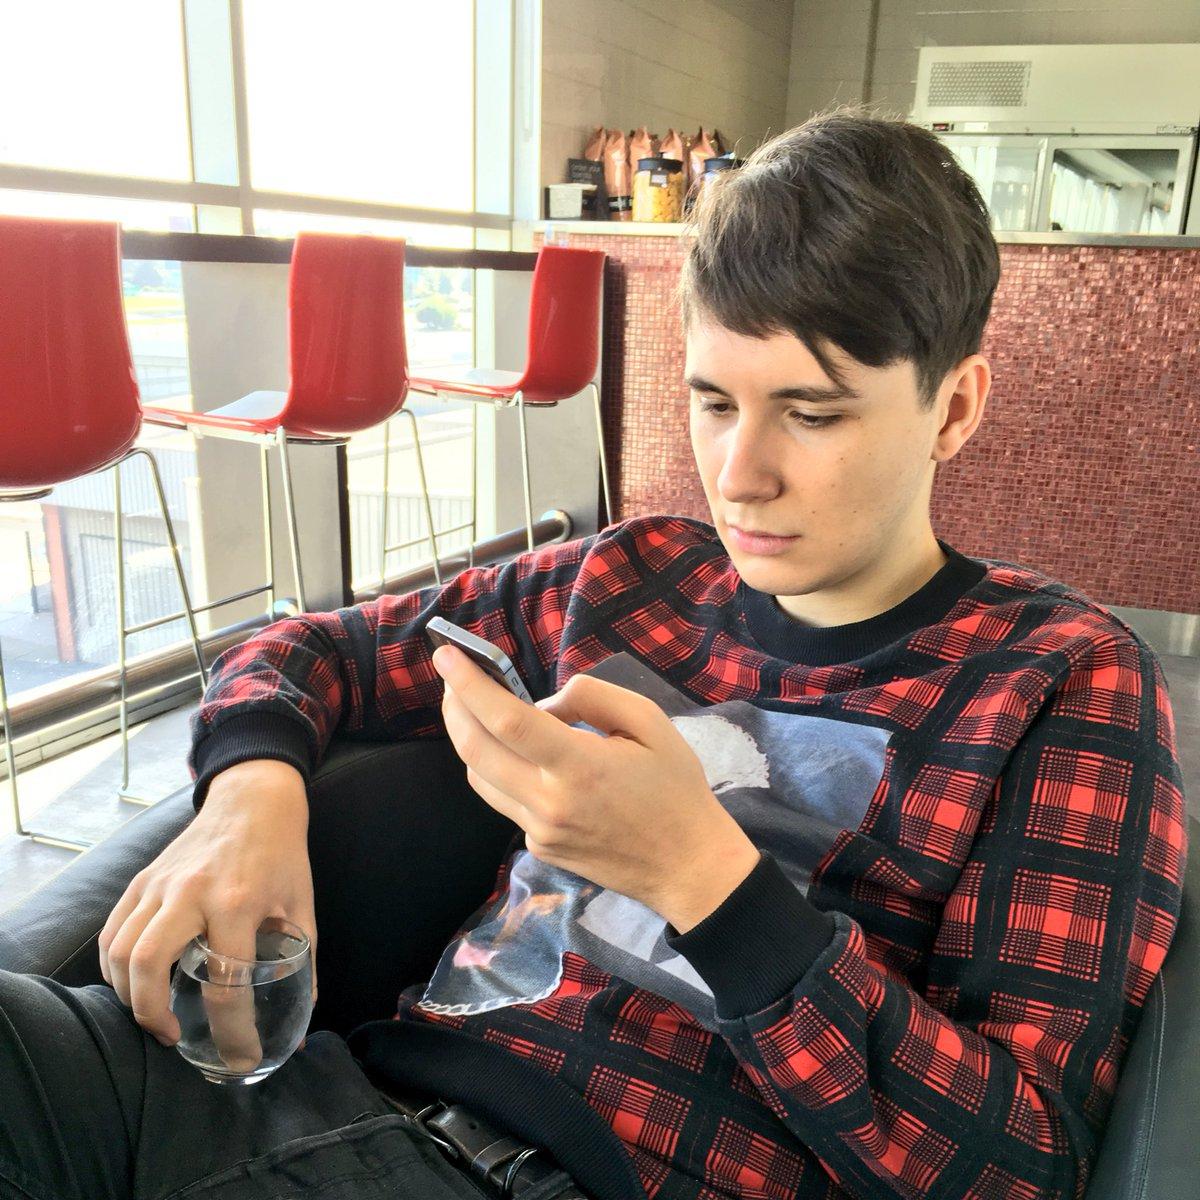 Dan burnt his finger on a toaster lol https://t.co/qawx64qCui